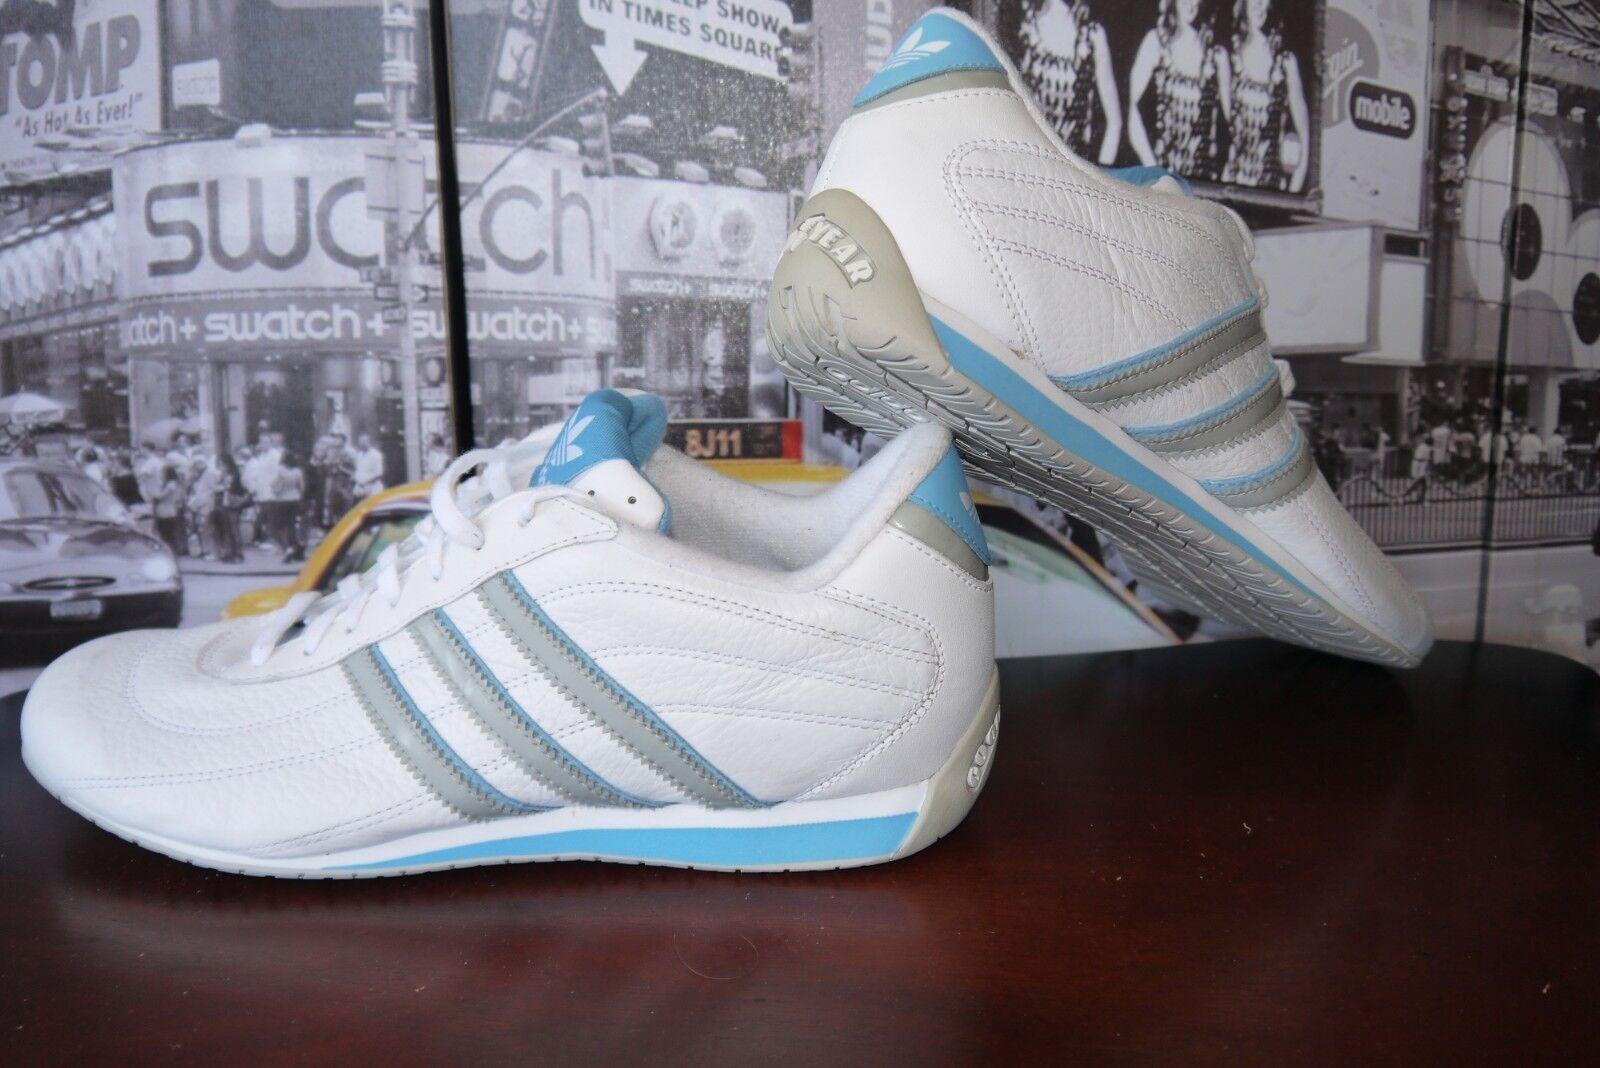 OG 2006 TEAM Adidas Jerez 3 W white Leather Good Year Sneaker women's US 10 42.5